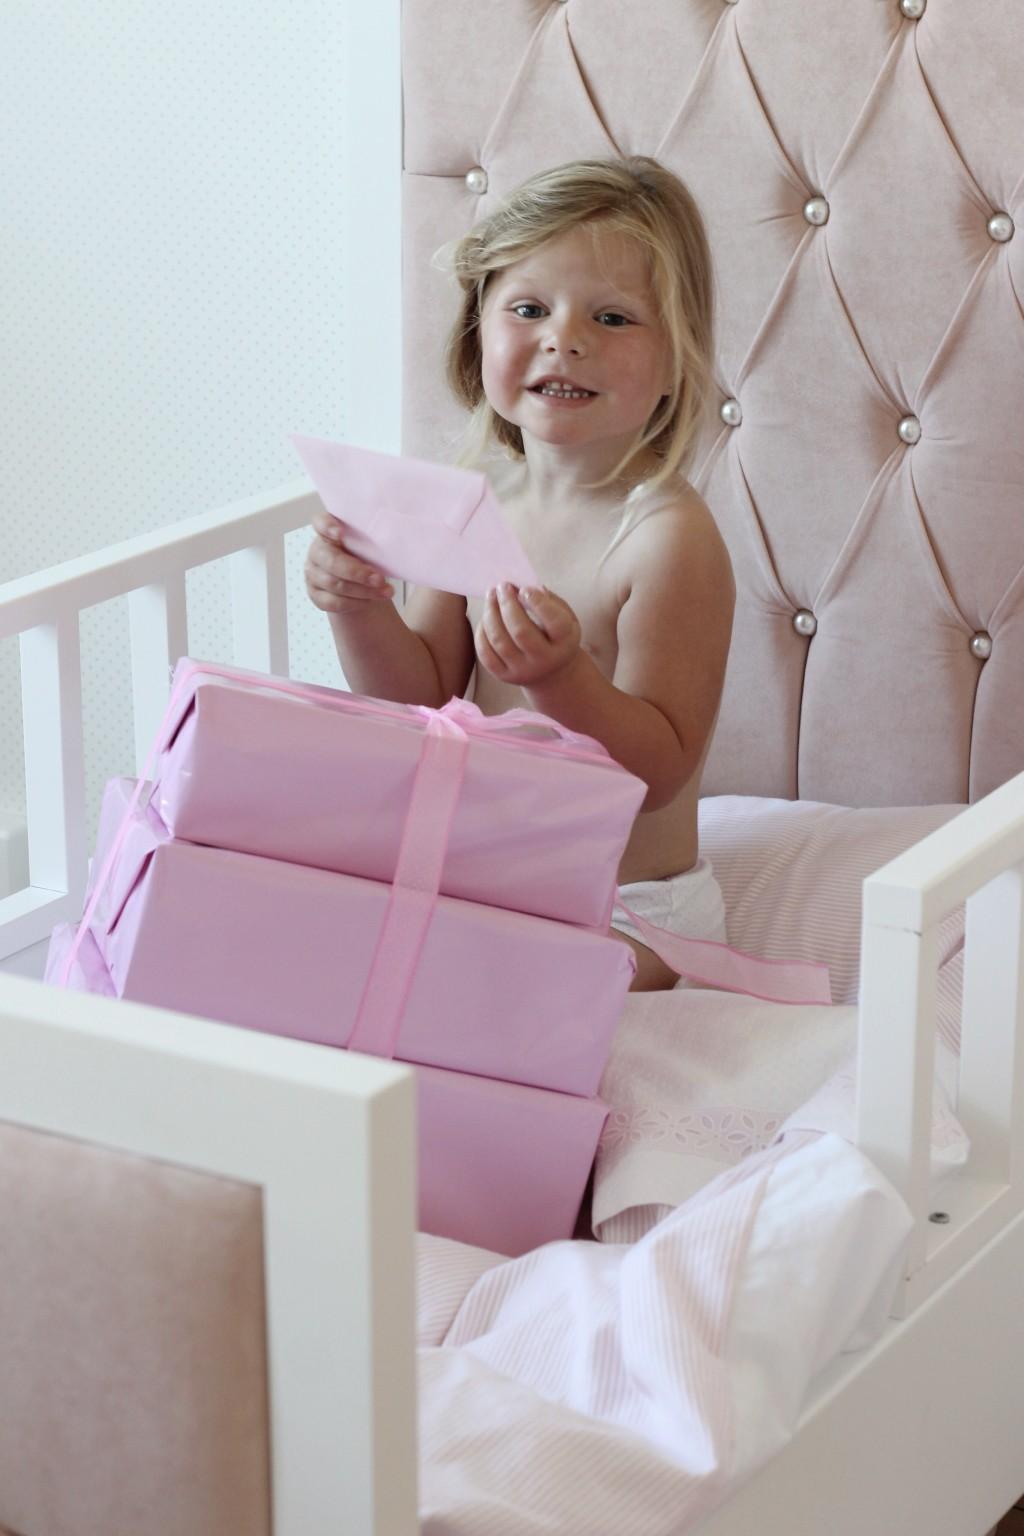 4 års present Nellie 4 år ♡ – Rebecca Dufwall 4 års present